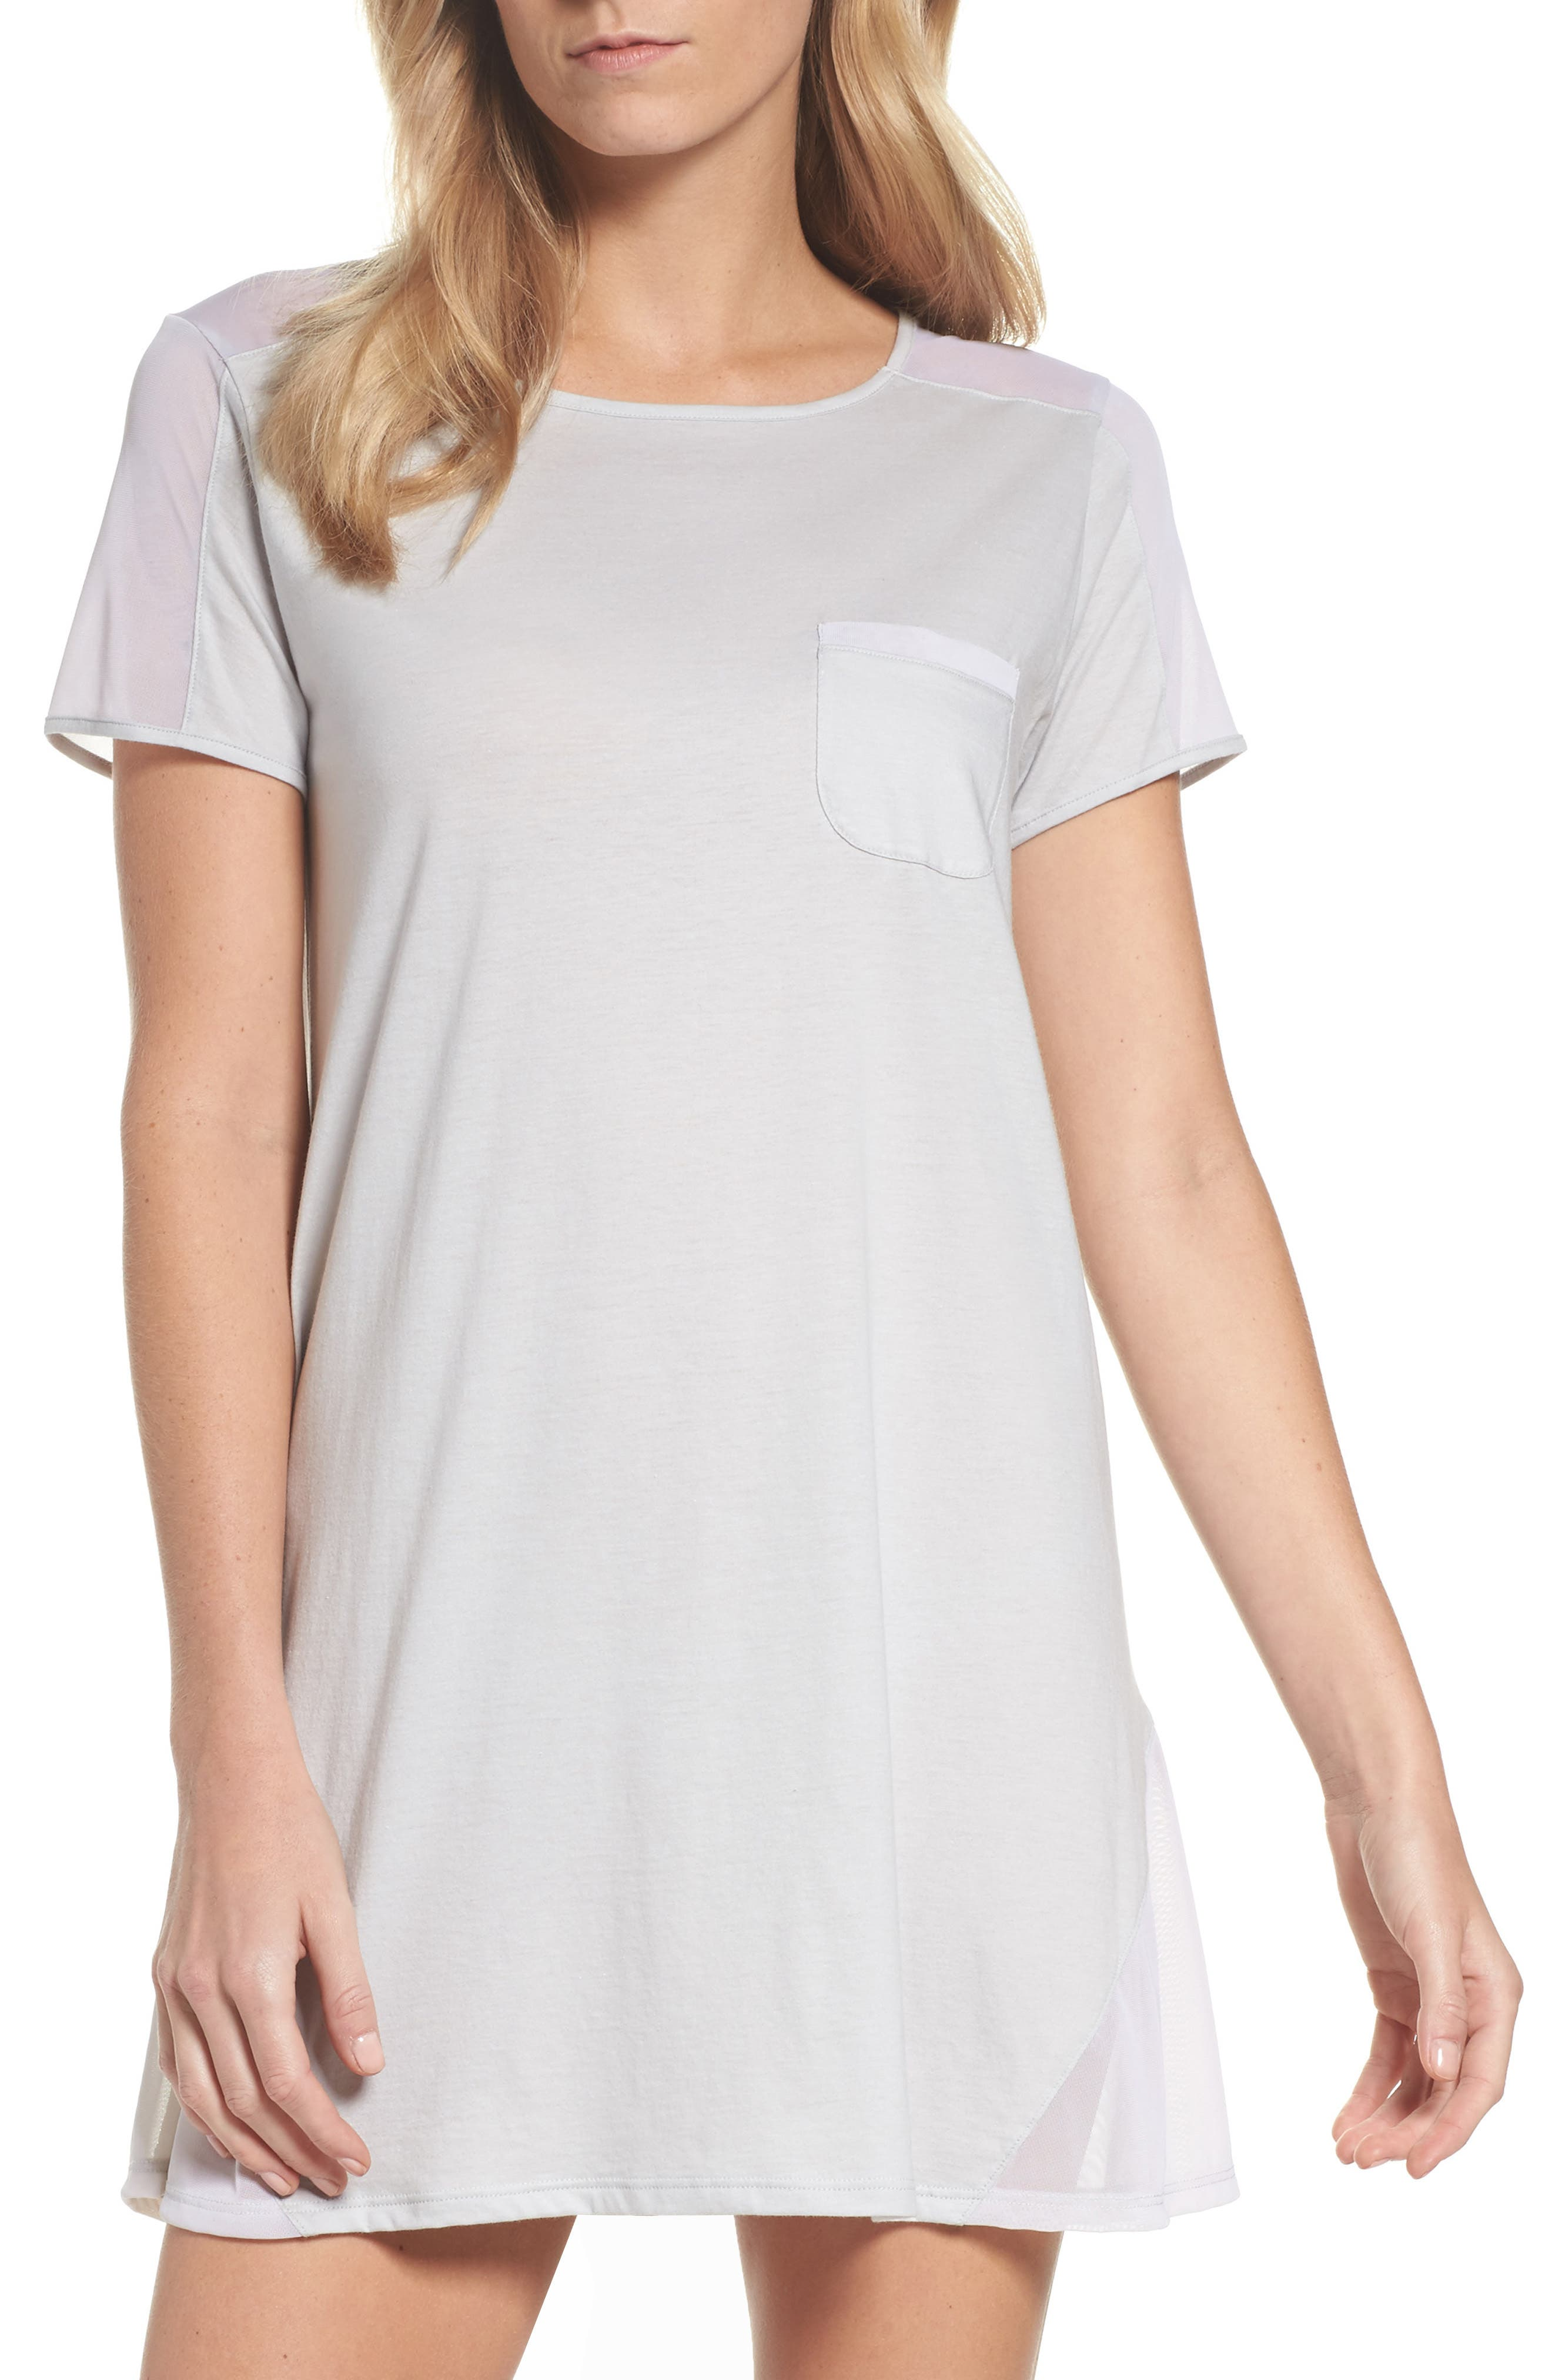 Cotton Sleep Shirt,                             Main thumbnail 1, color,                             Soft Gray